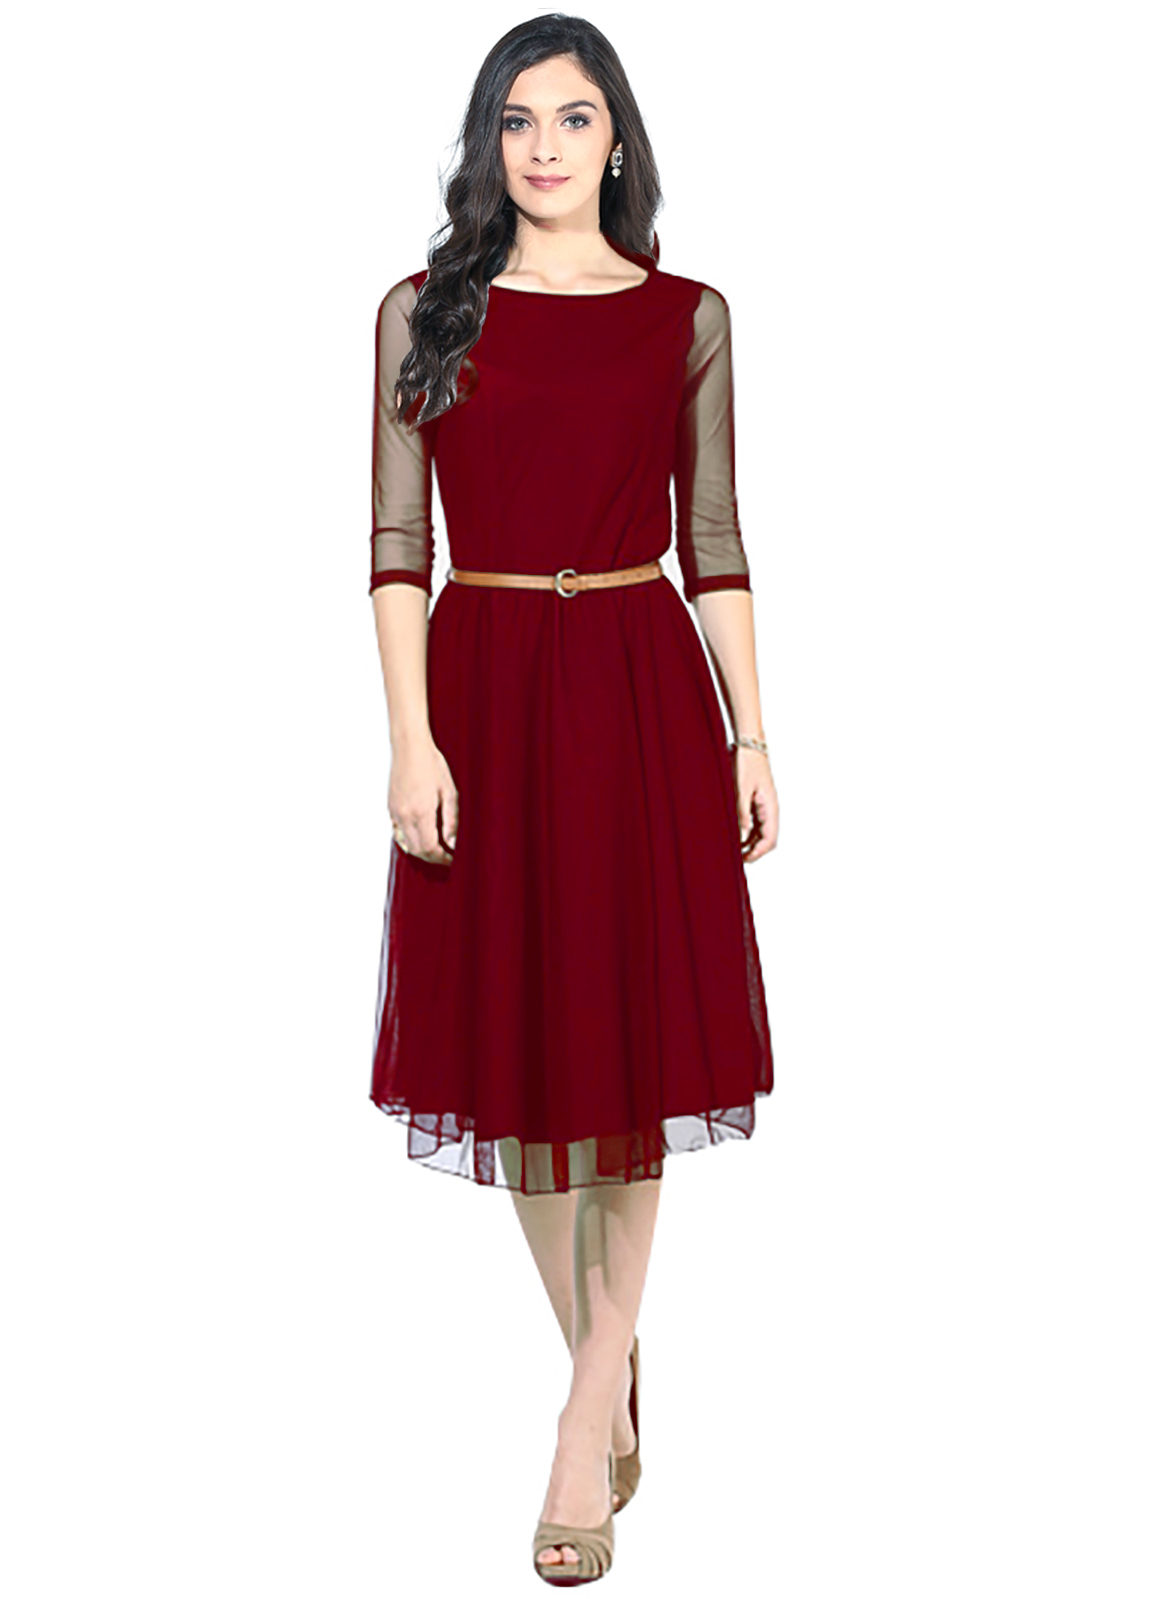 regonsell2 Maroon Moon Light Dress Color Printed Western Dress